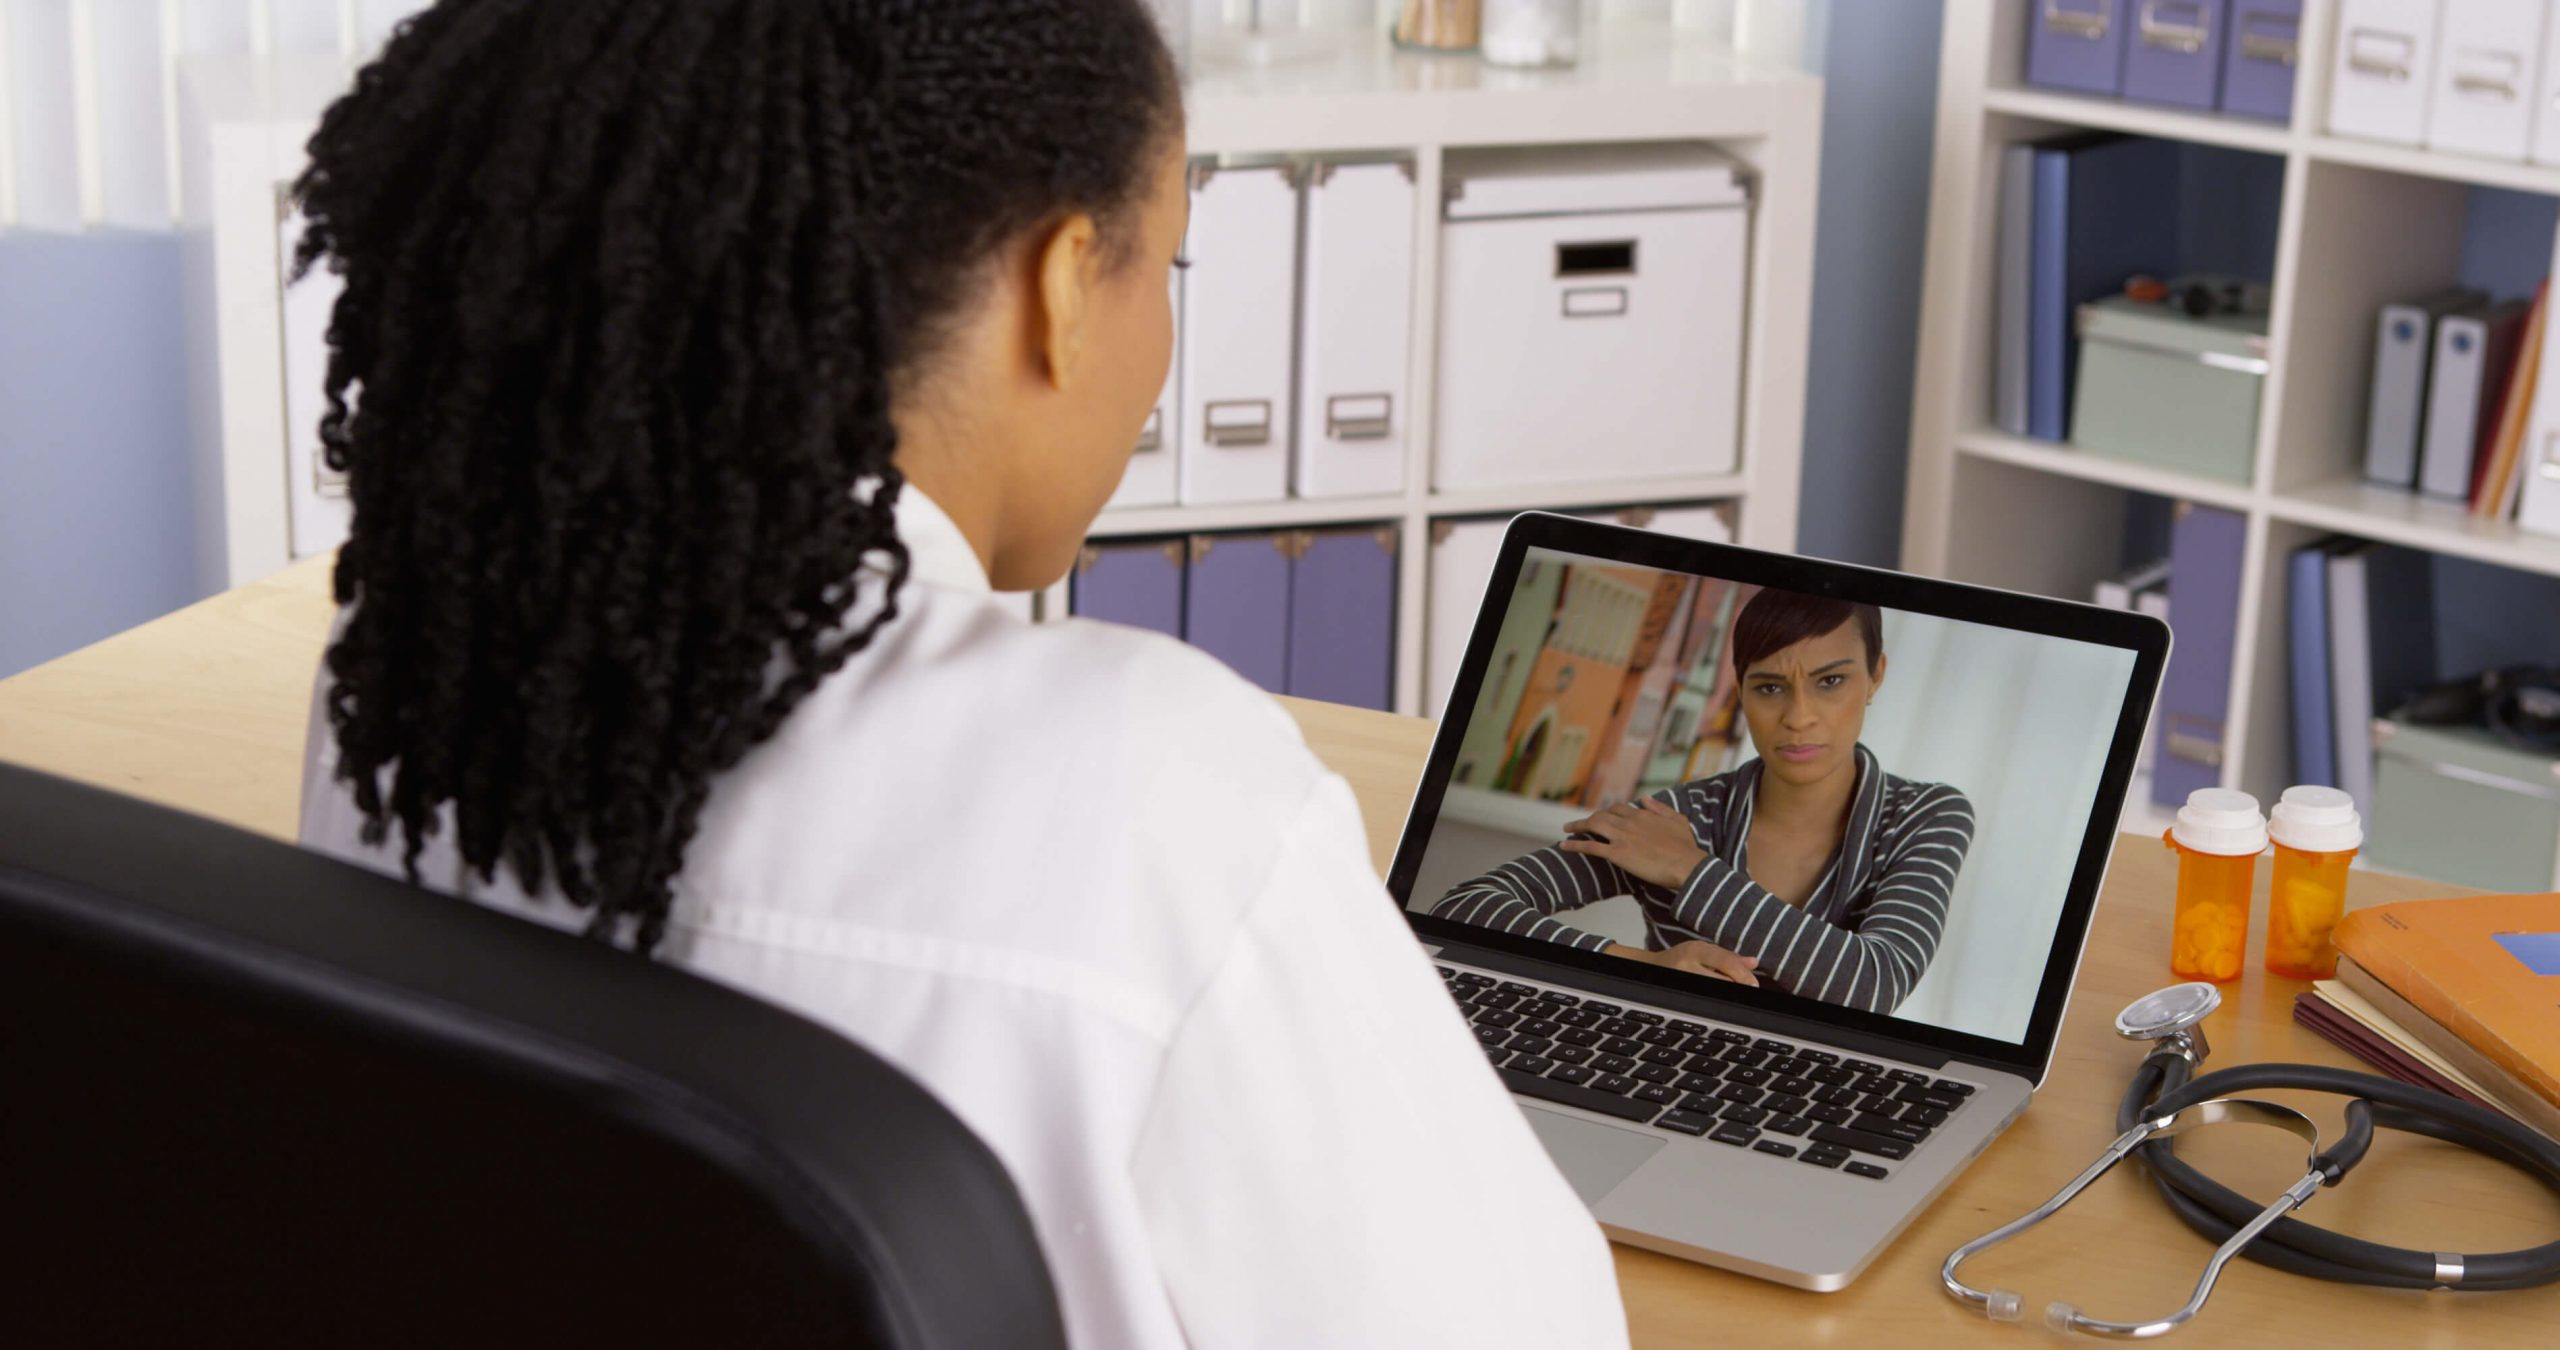 Development of a video and health data platform